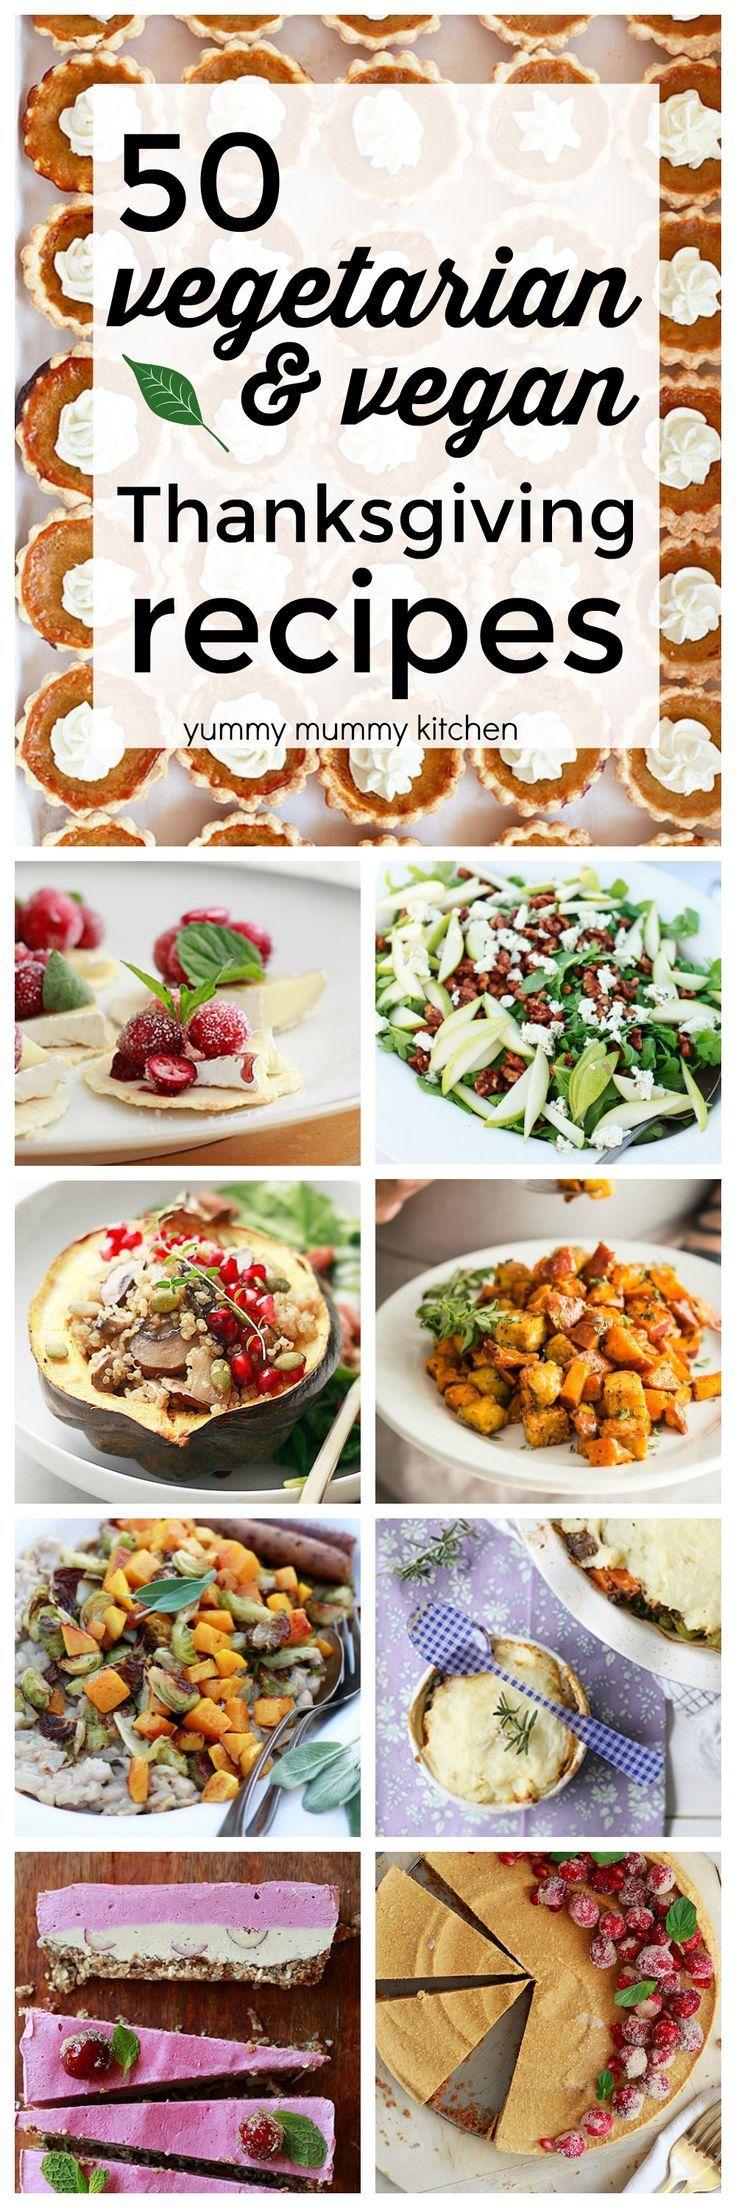 Delicious vegetarian, vegan, plant-based Thanksgiving recipes. From vegetarian Thanksgiving appetizers, to vegan Thanksgiving dinner ideas, to vegan pumpkin cheesecake!